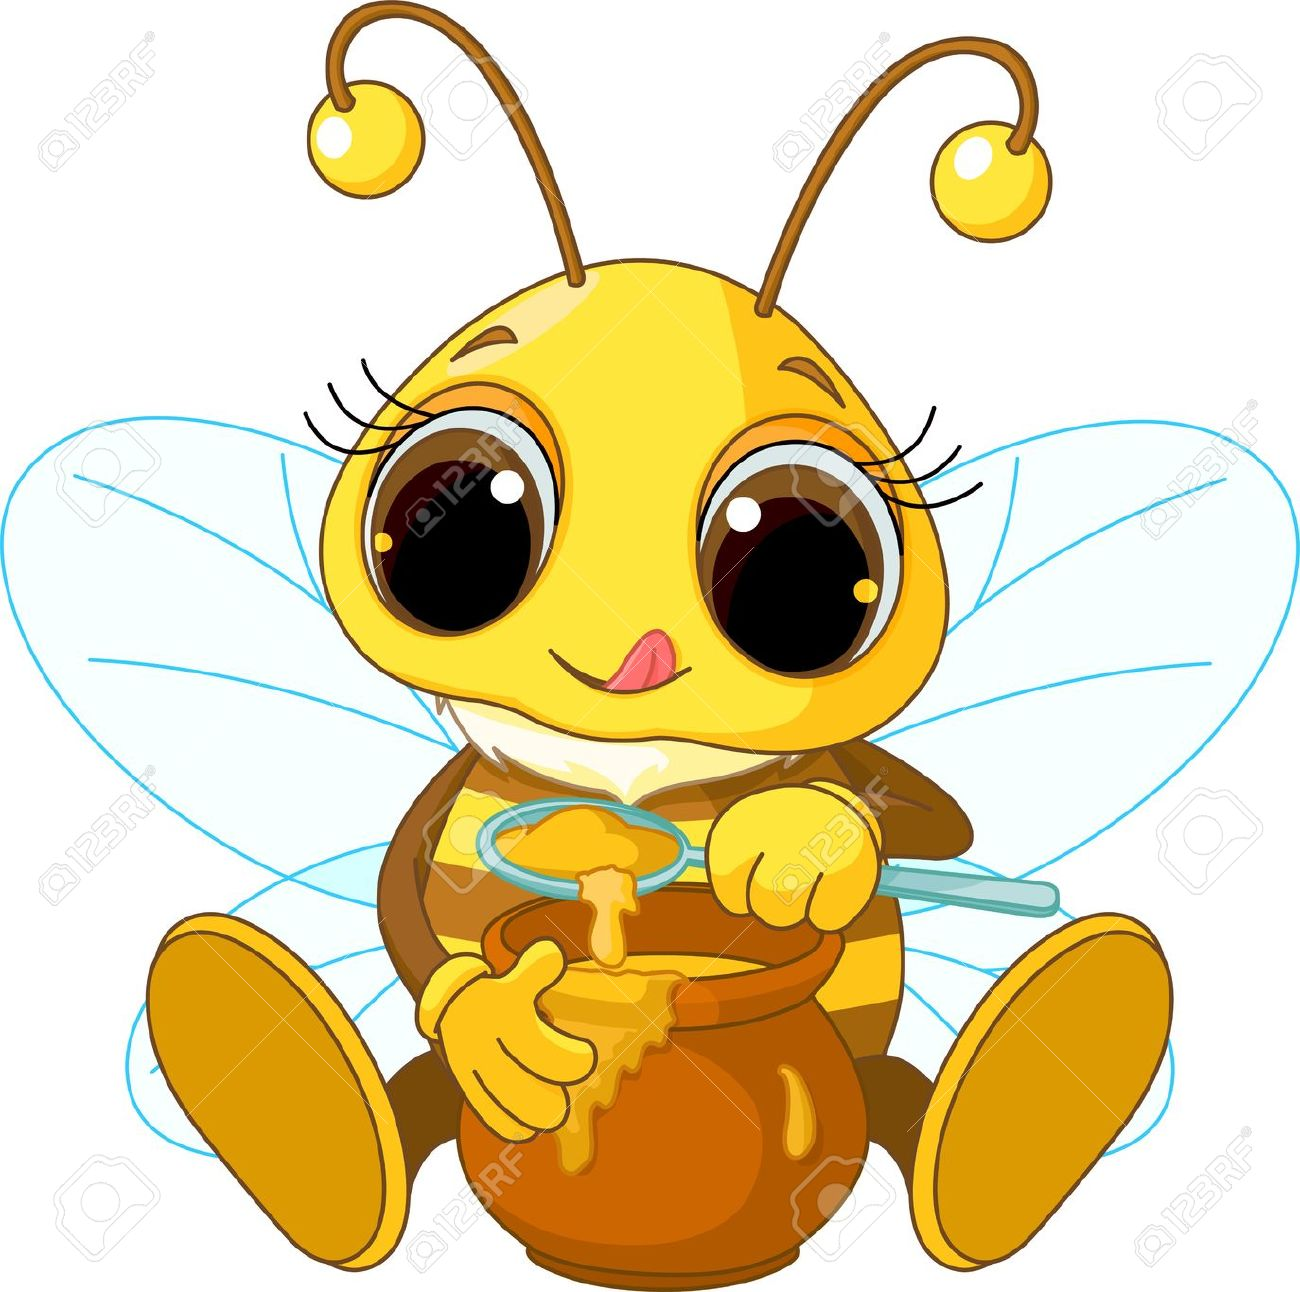 1300x1292 Cartoon Bee Stock Photos, Pictures, Royalty Free Cartoon Bee